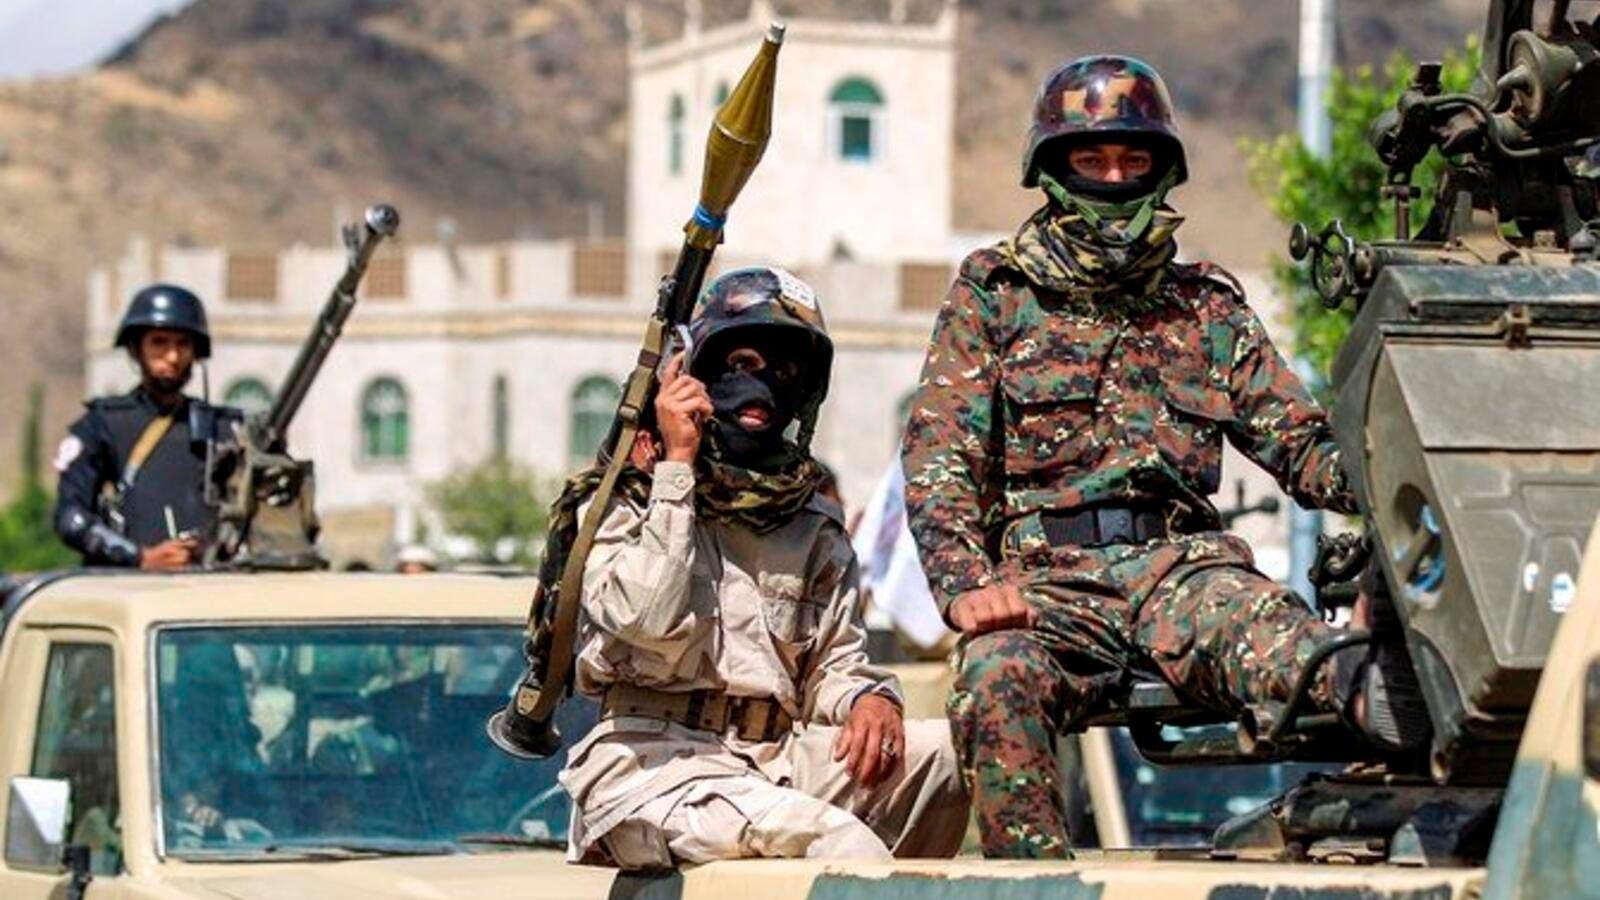 Yemen rebels say dozens killed in Saudi-led airstrikes